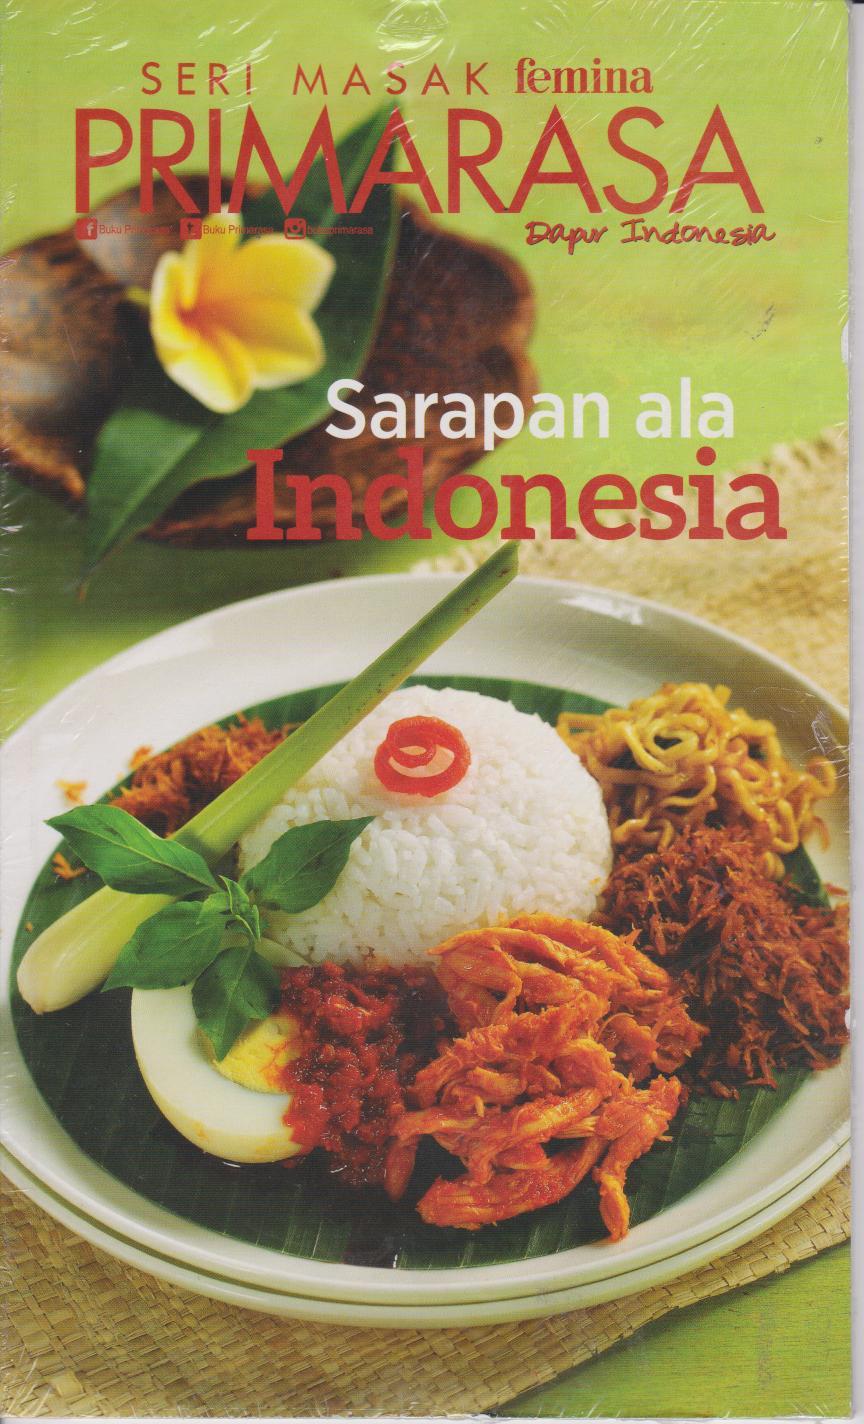 PRIMARASA DAPUR INDONESIA : SARAPAN ALA INDONESIA en